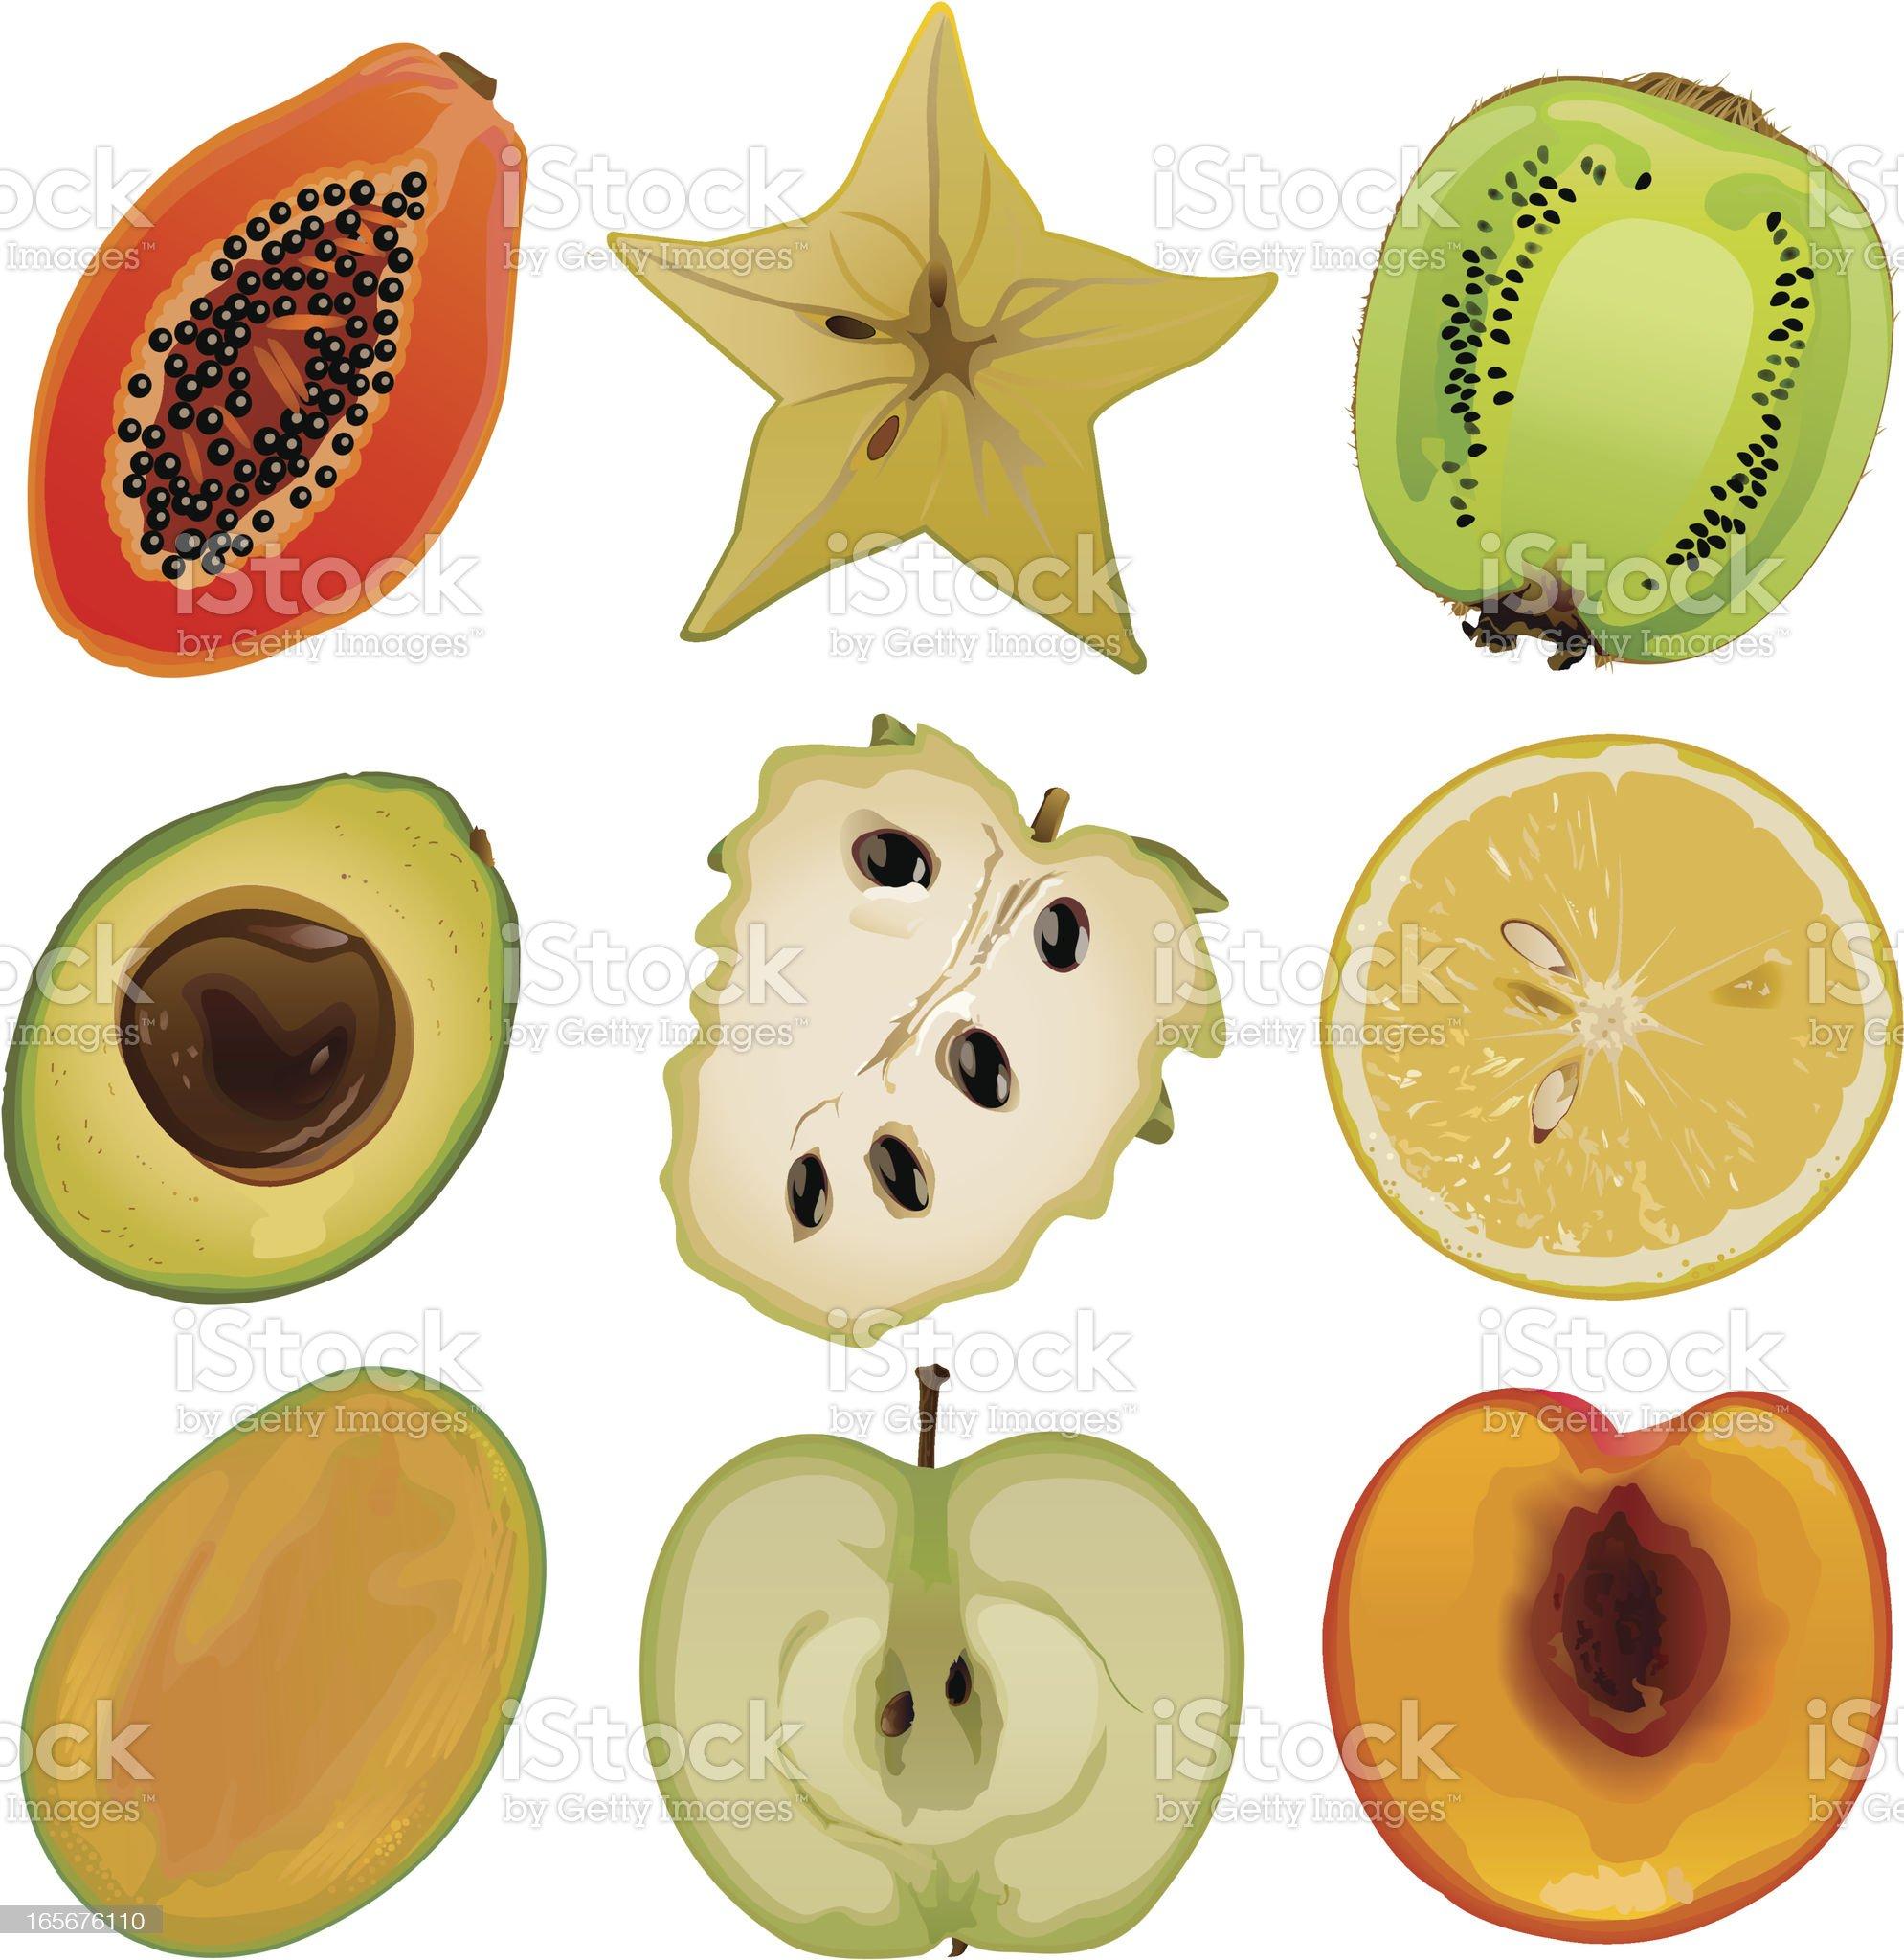 Fruit core1 royalty-free stock vector art